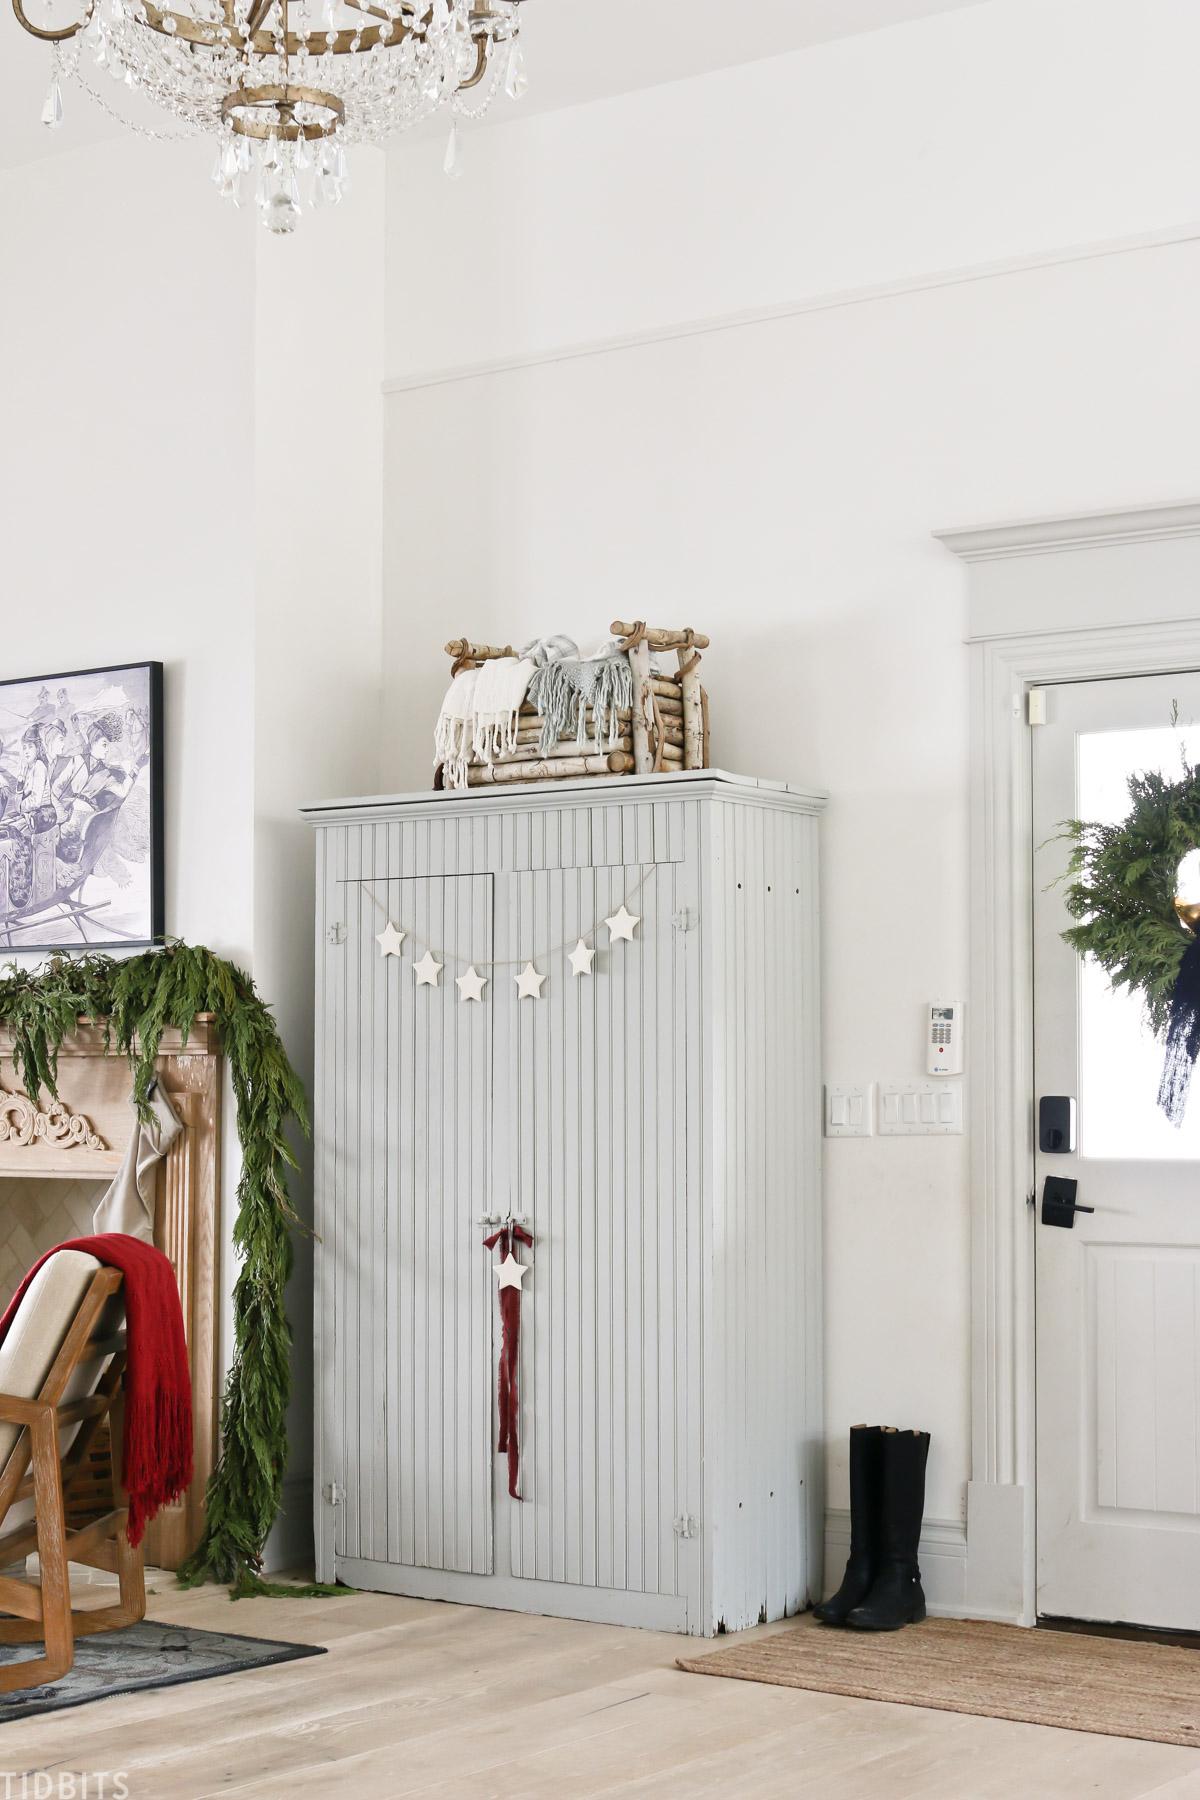 light blue cabinet next to side door